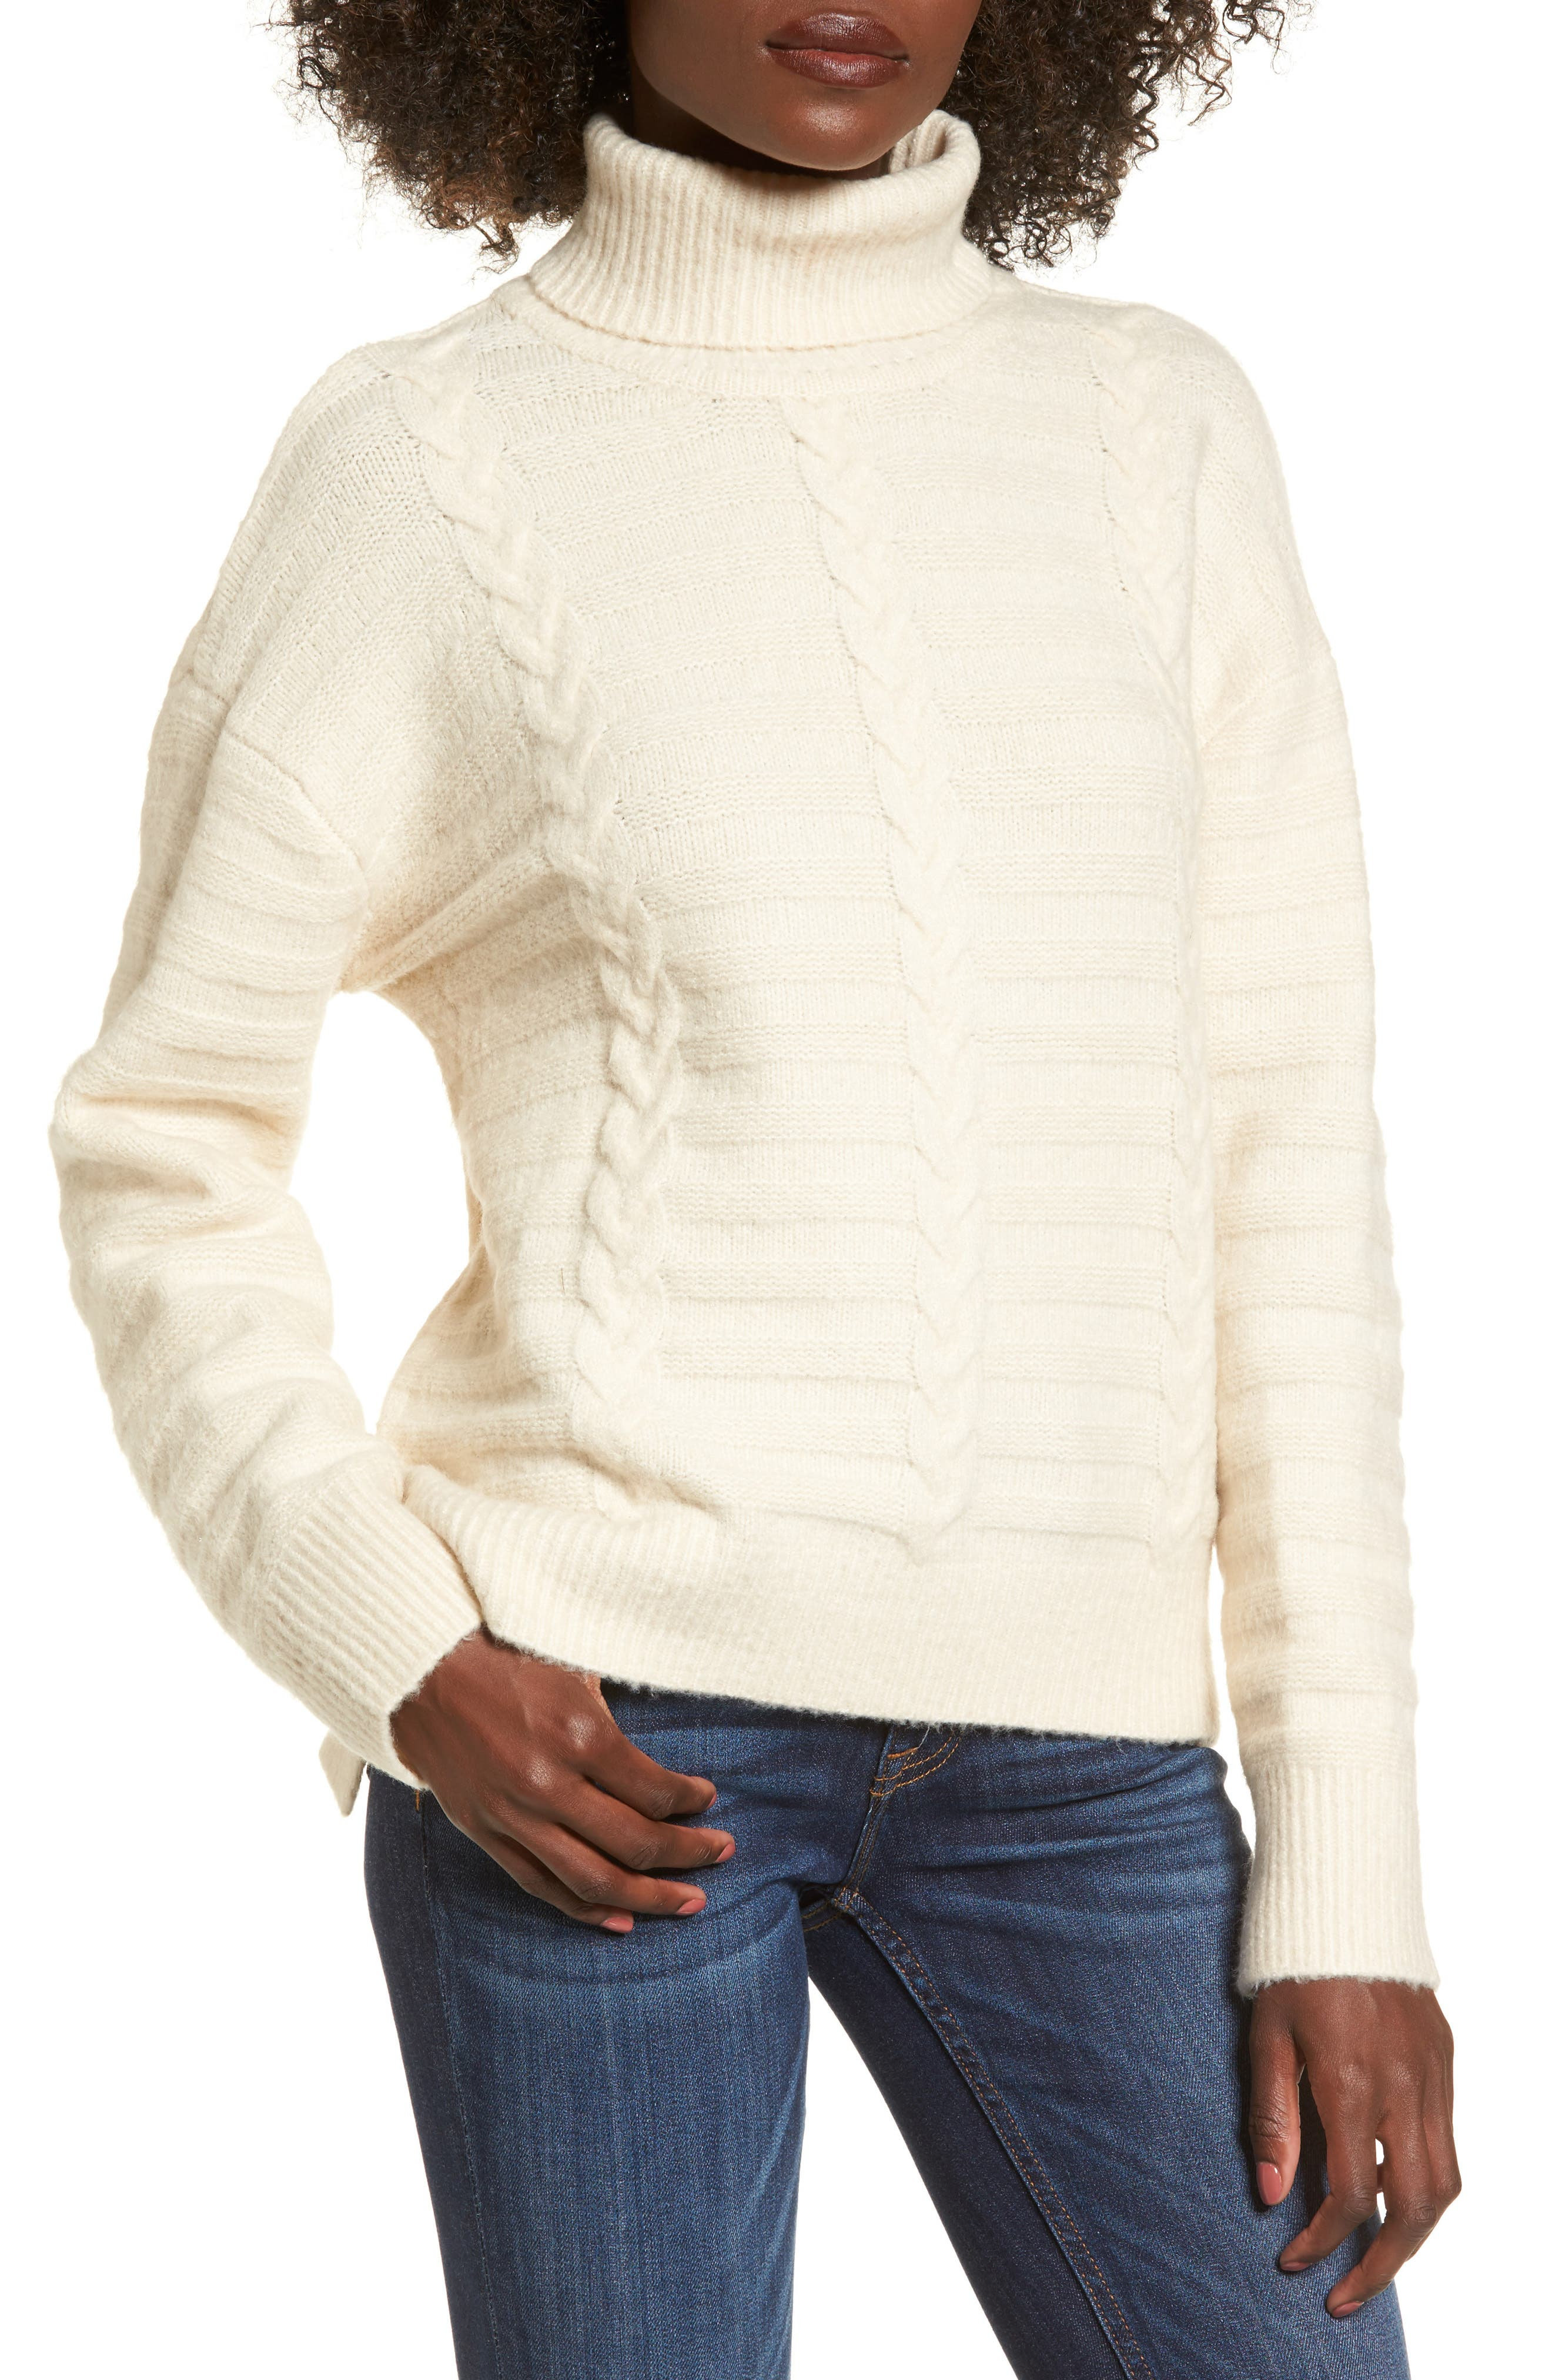 Main Image - MOON RIVER Turtleneck Sweater